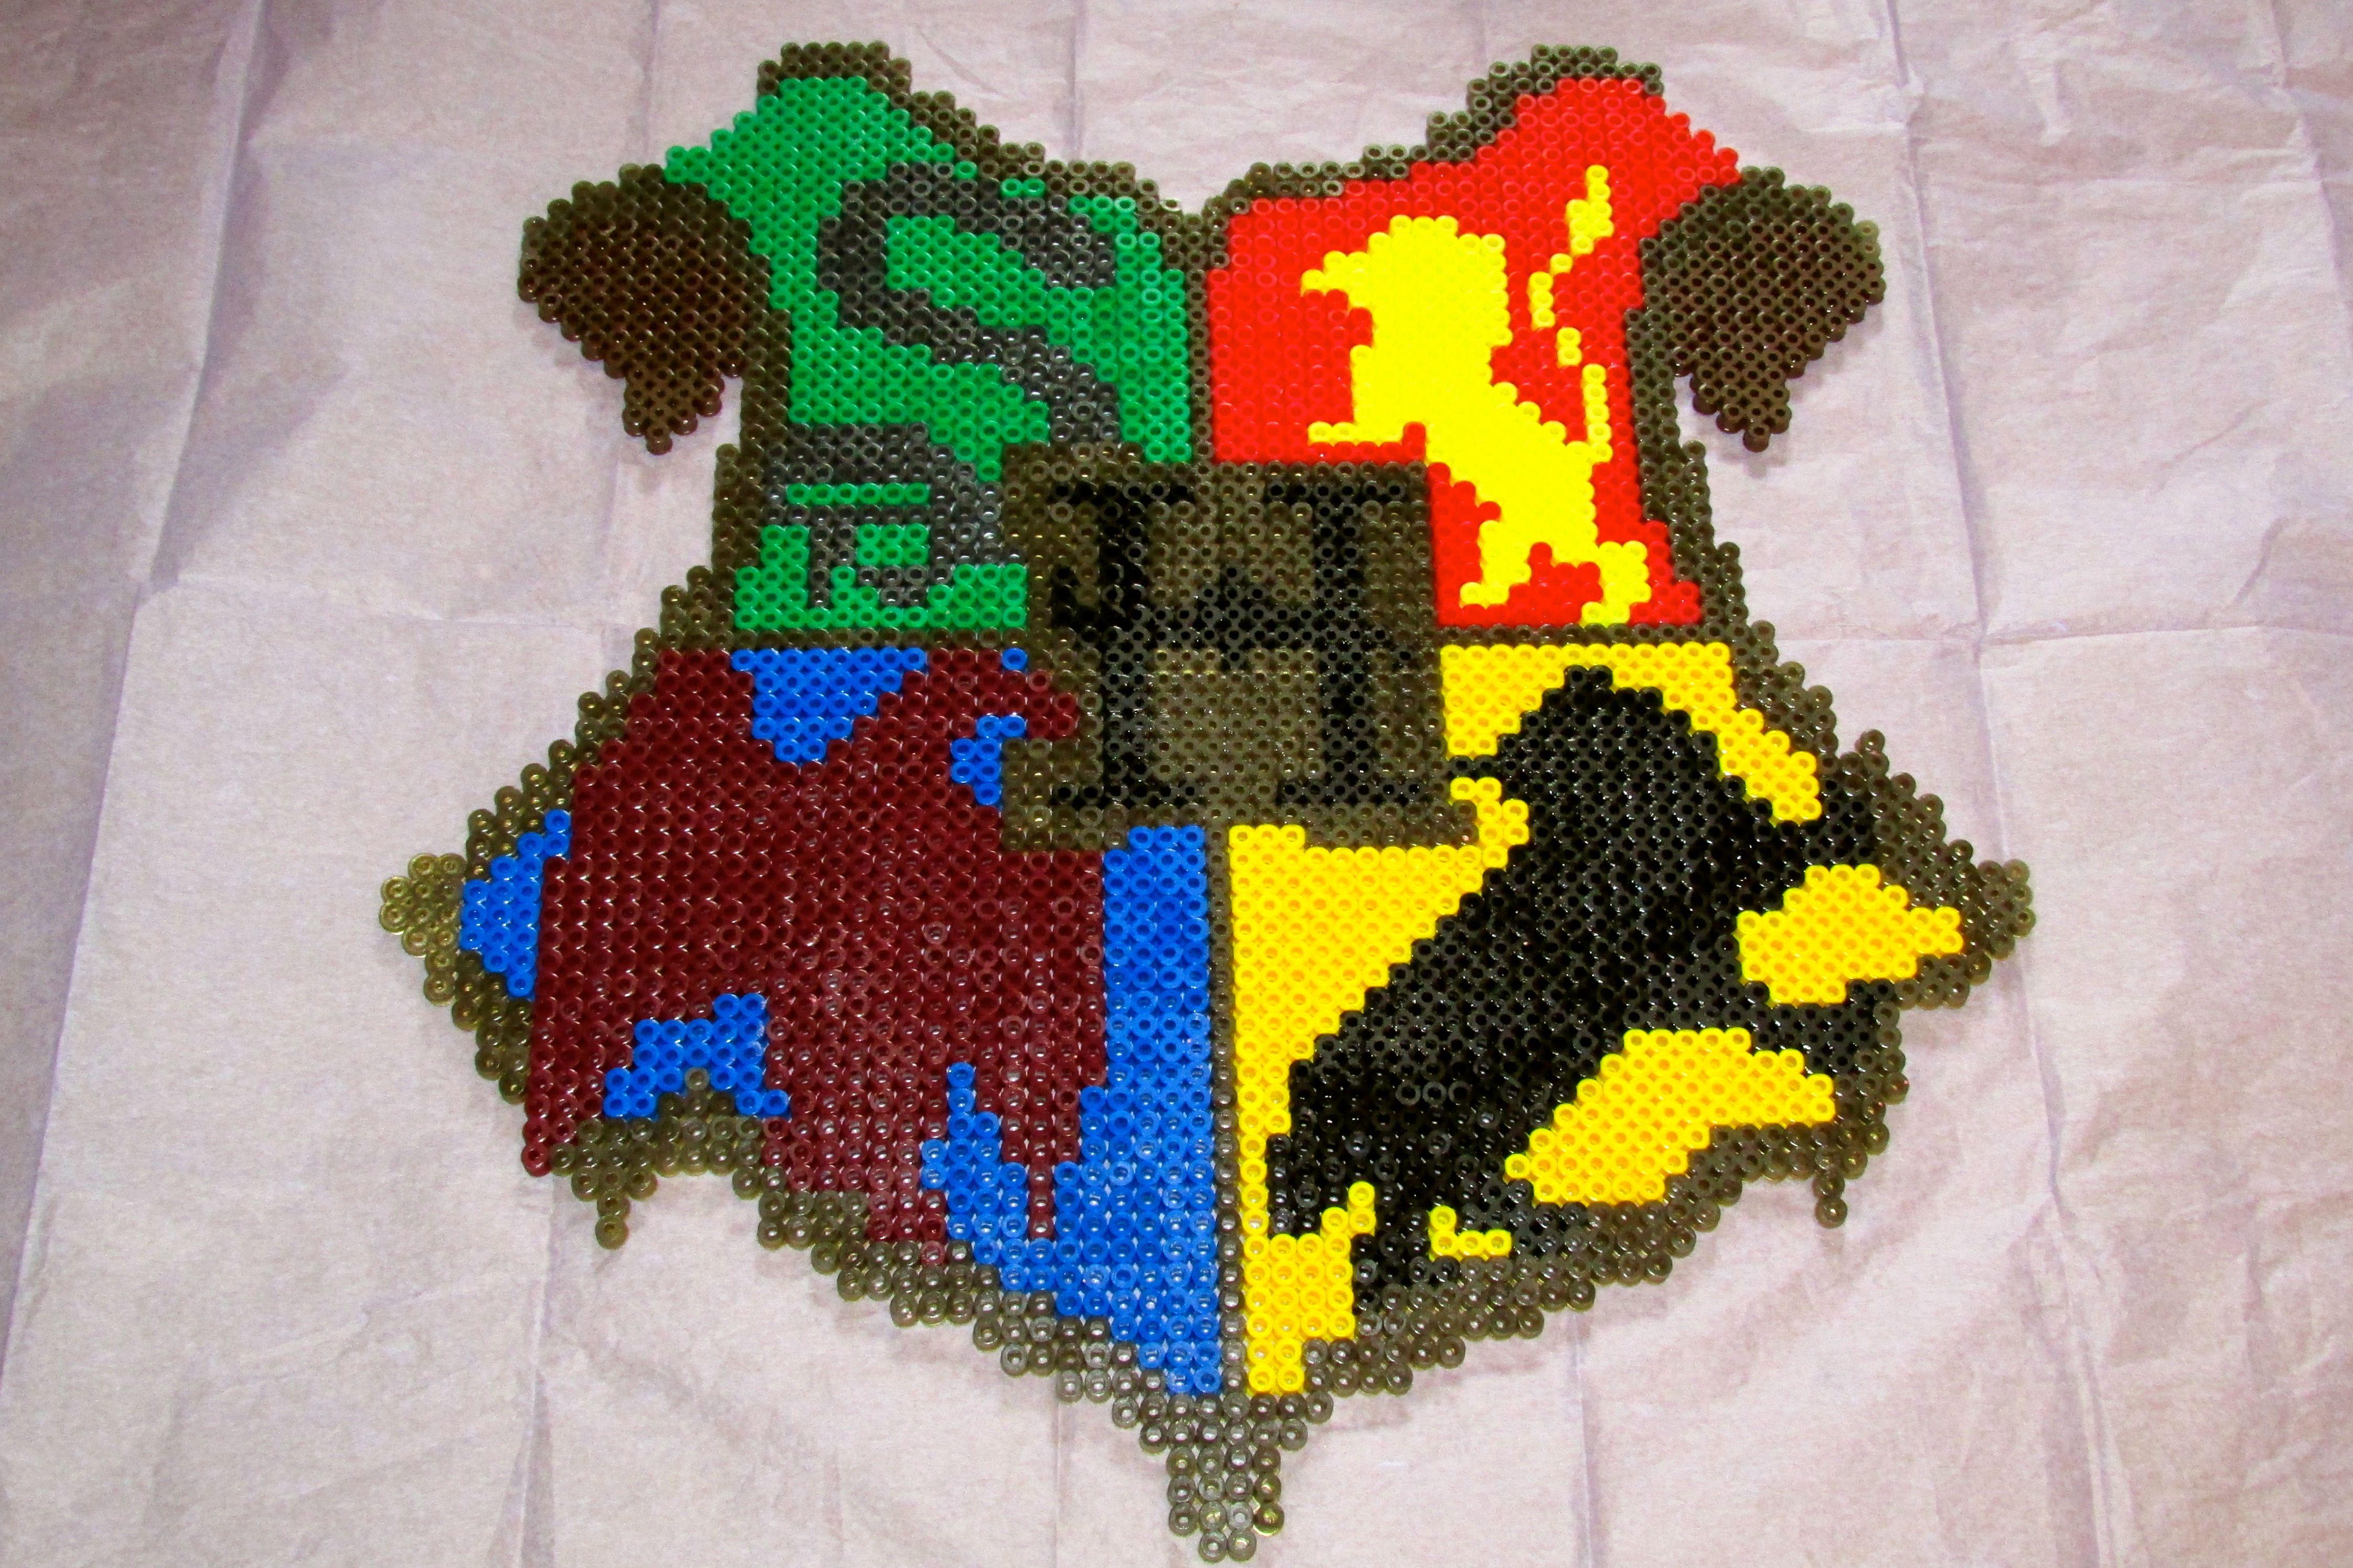 Harry Potter Hogwarts Crest Hama perler beads by Keely Jade   Harry ...